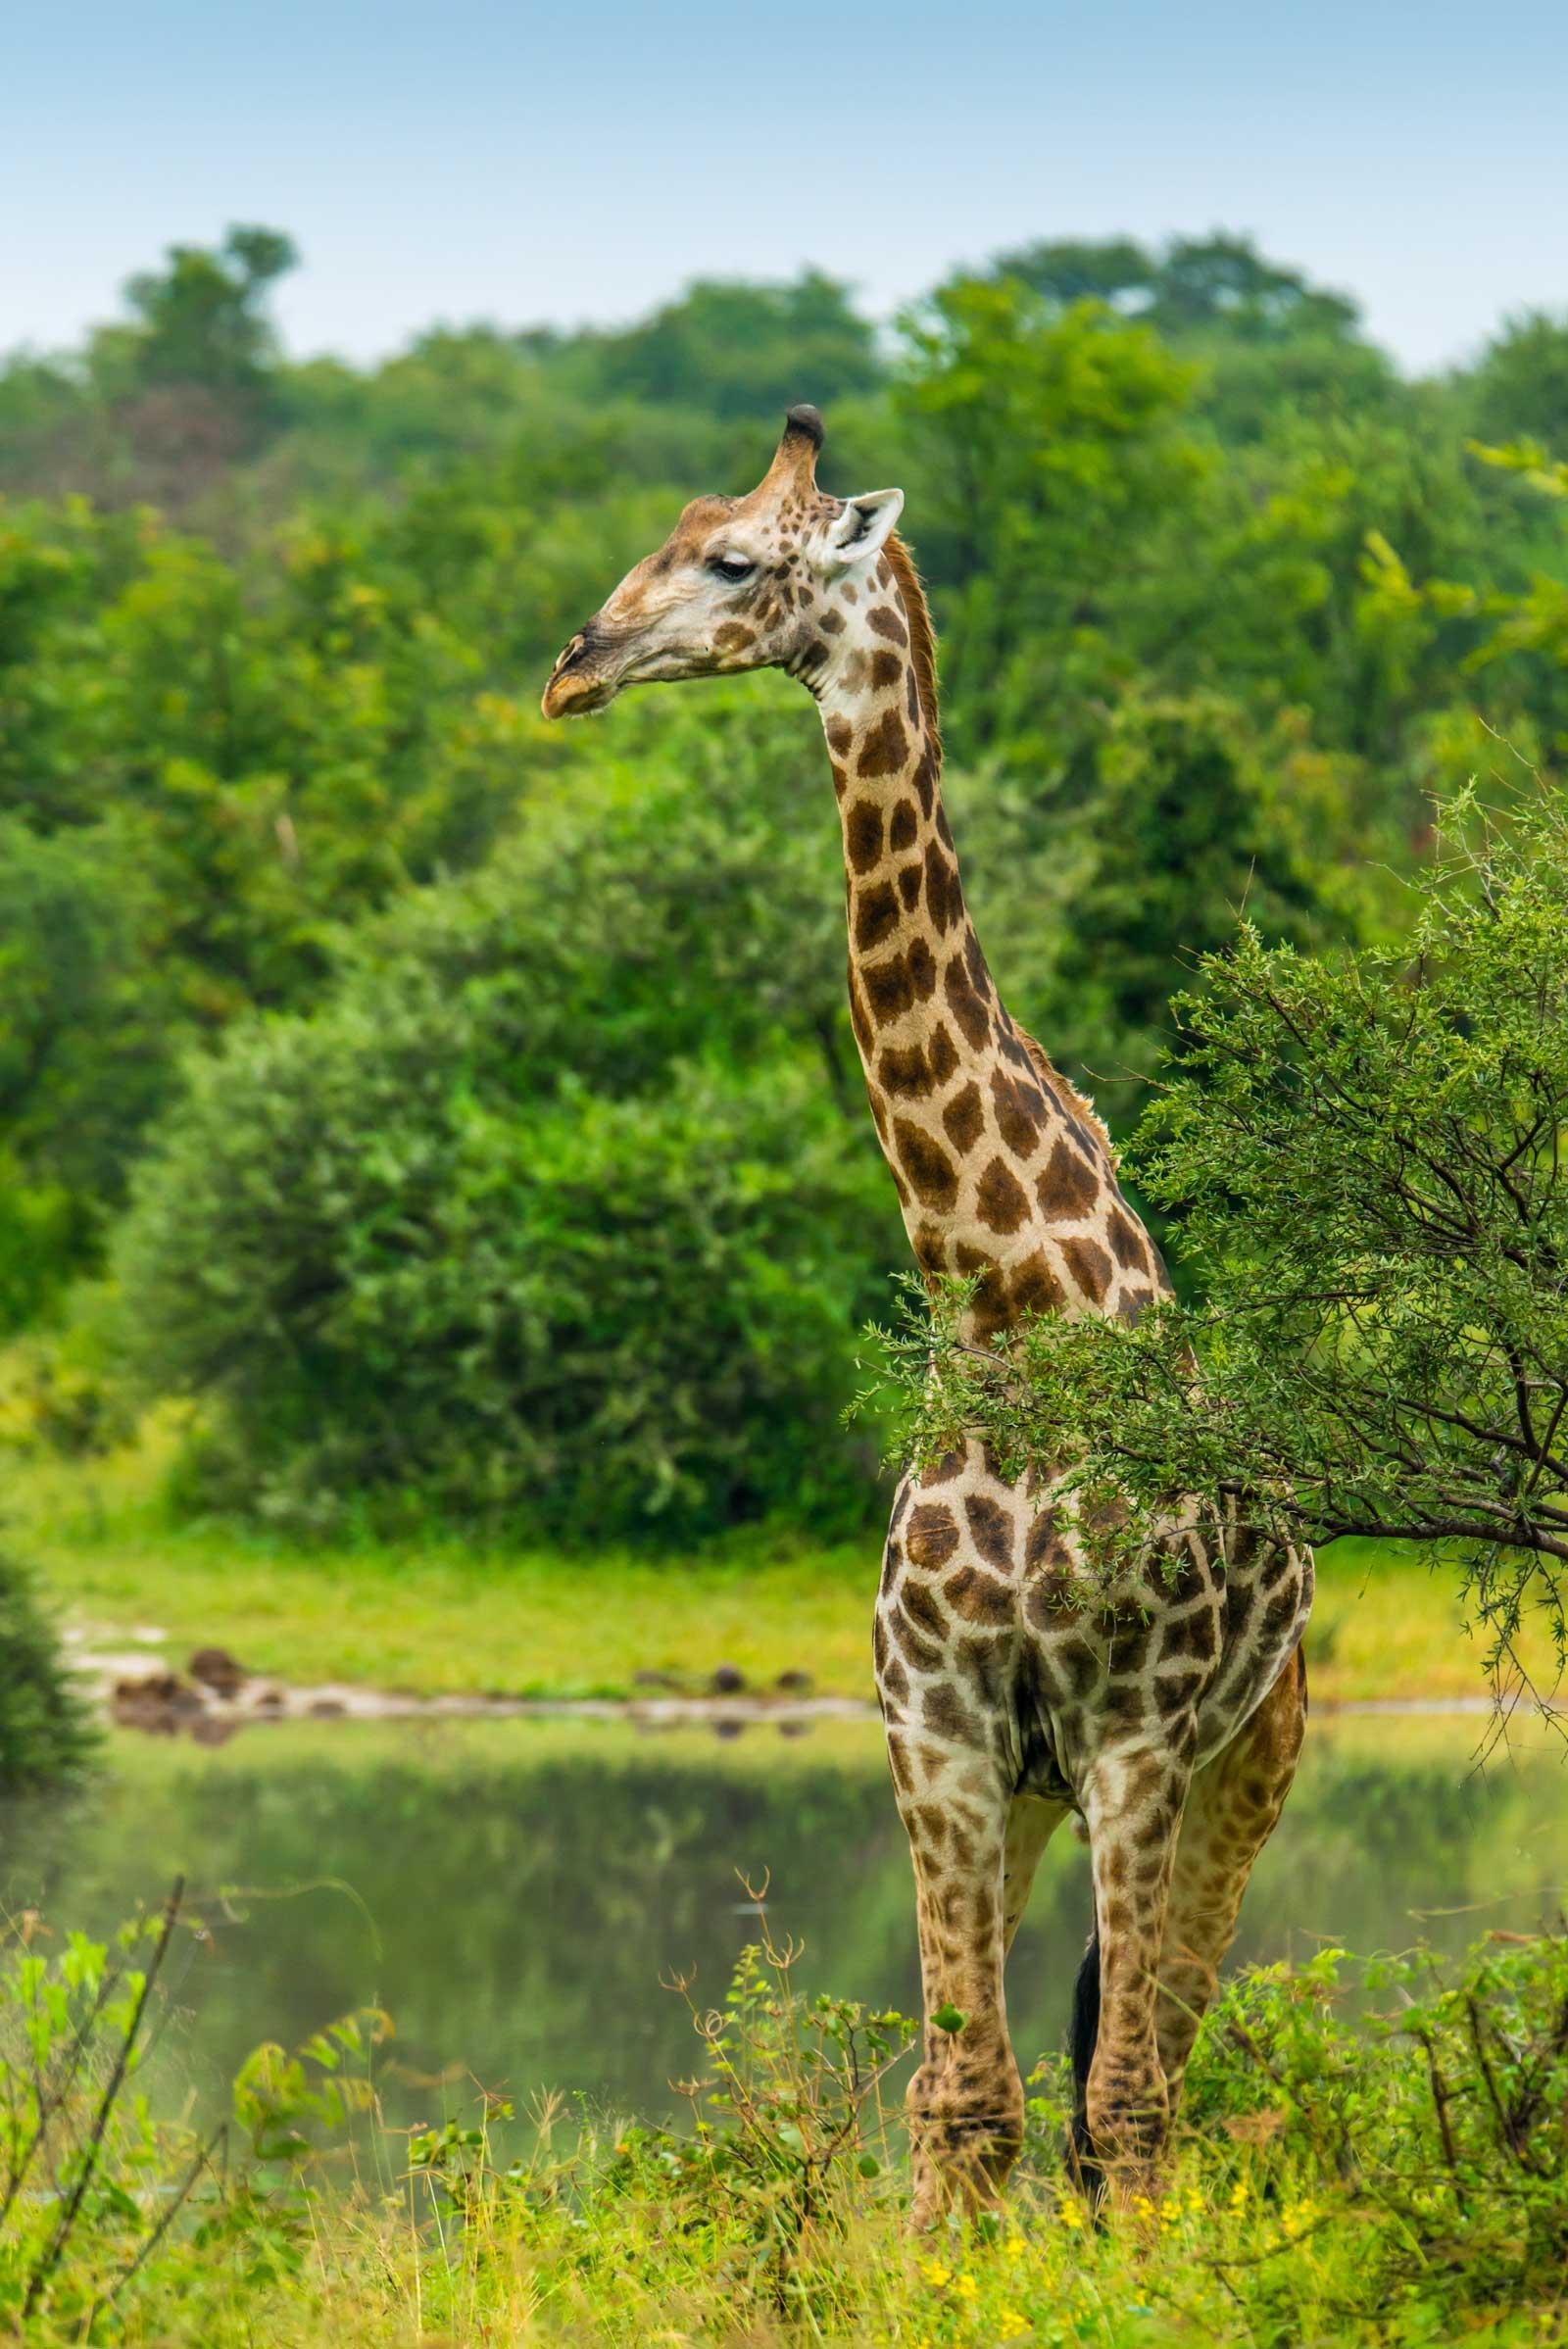 Giraffe profile by Kevin MacLaughlin